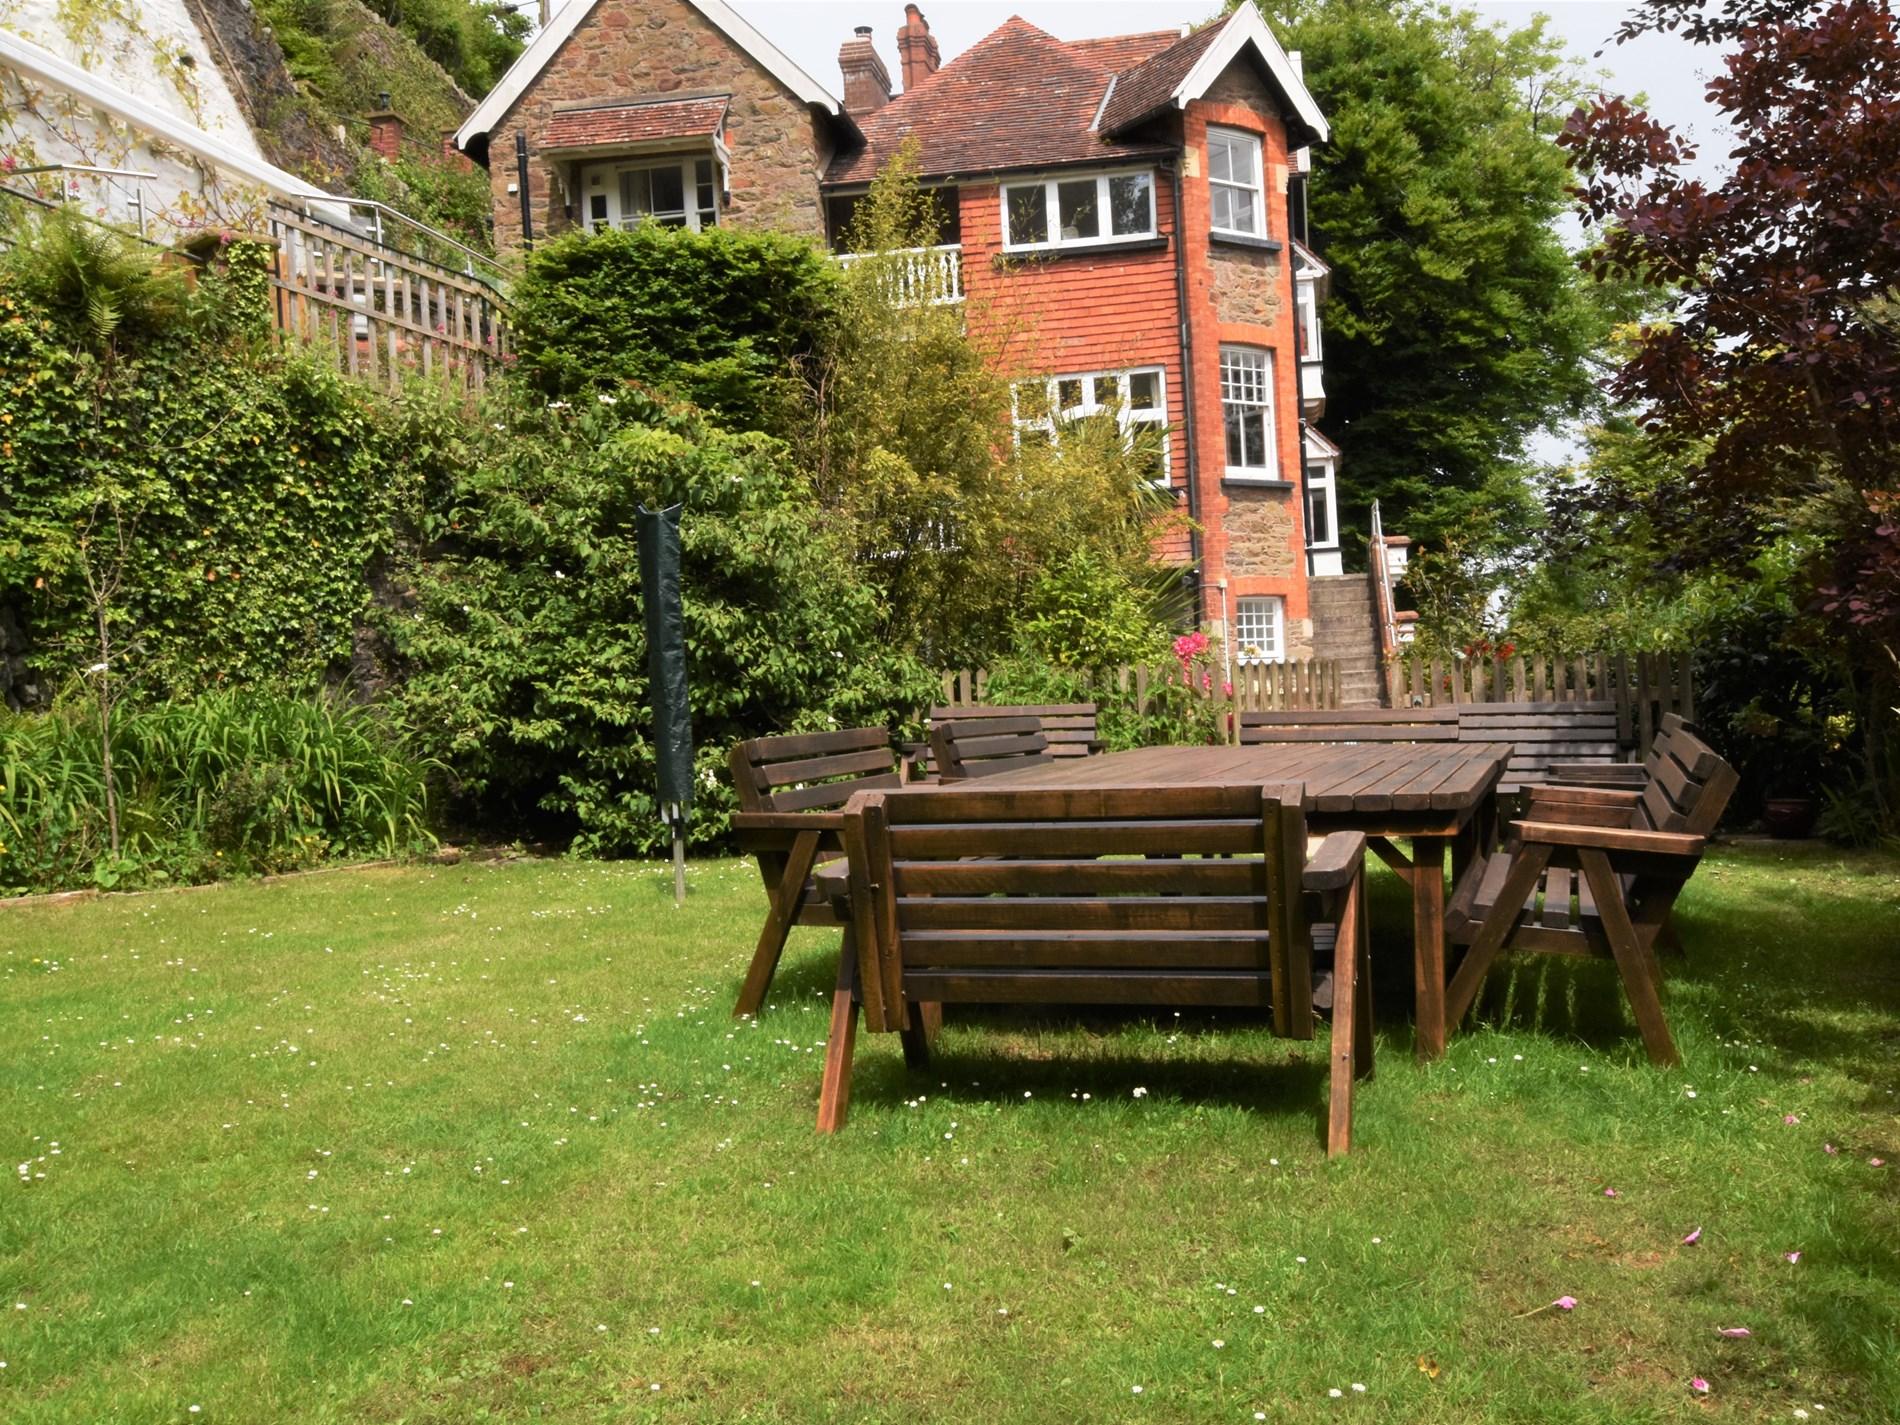 10 Bedroom House in North Devon, Devon